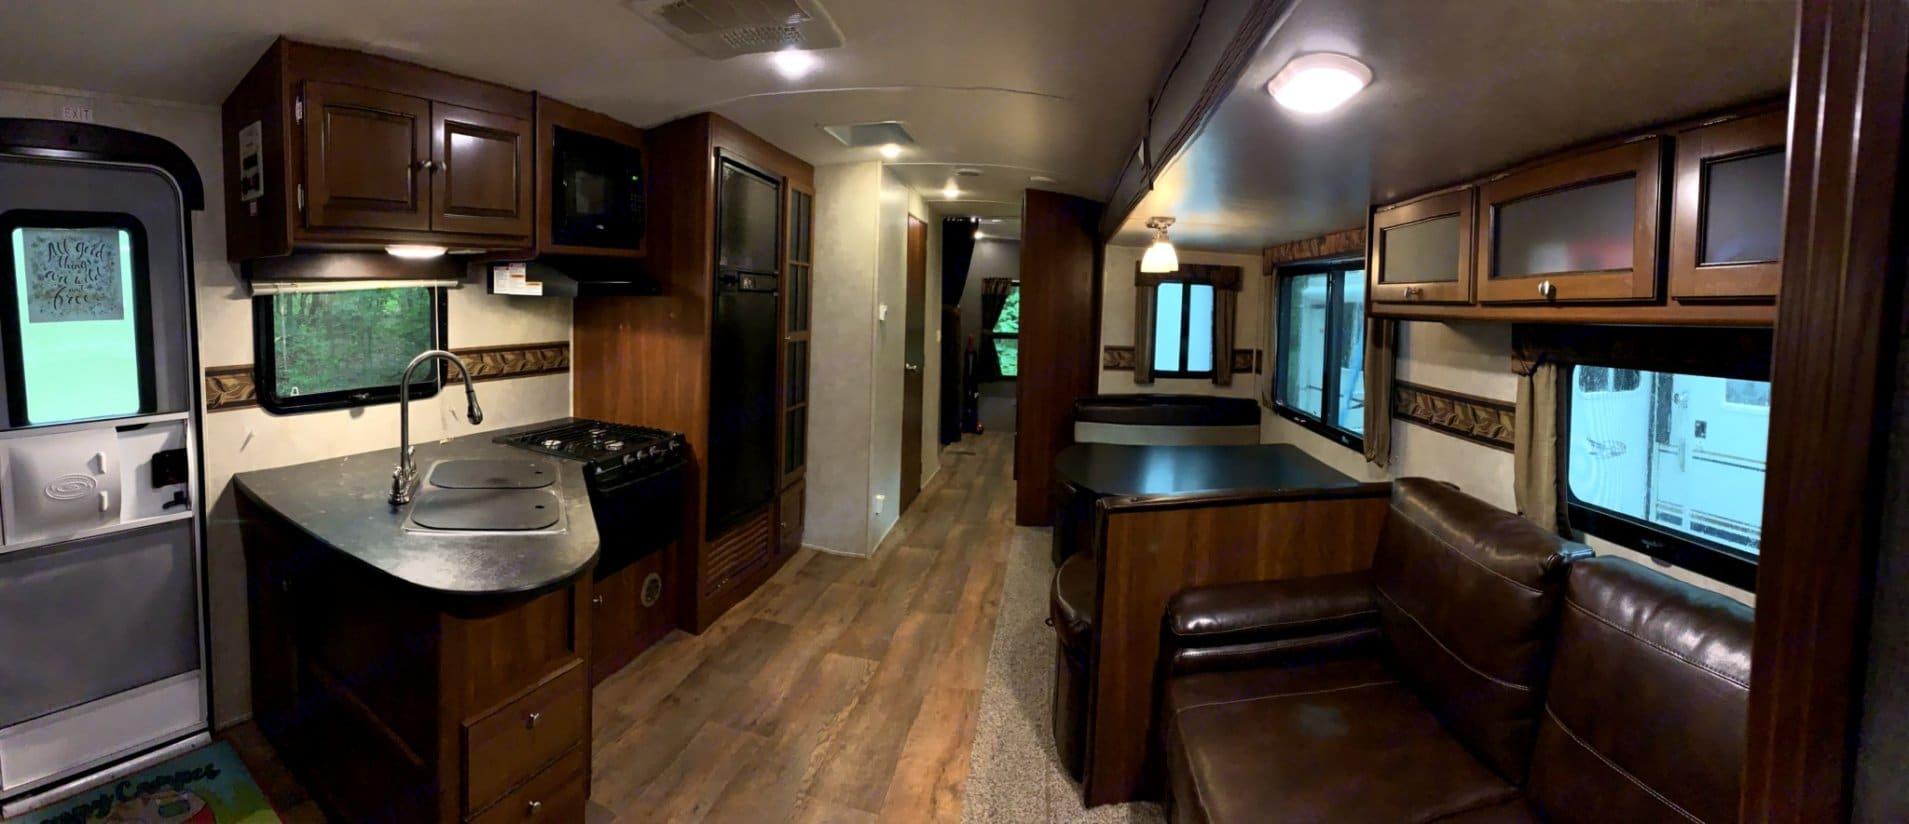 Living area. Keystone Premier 2015